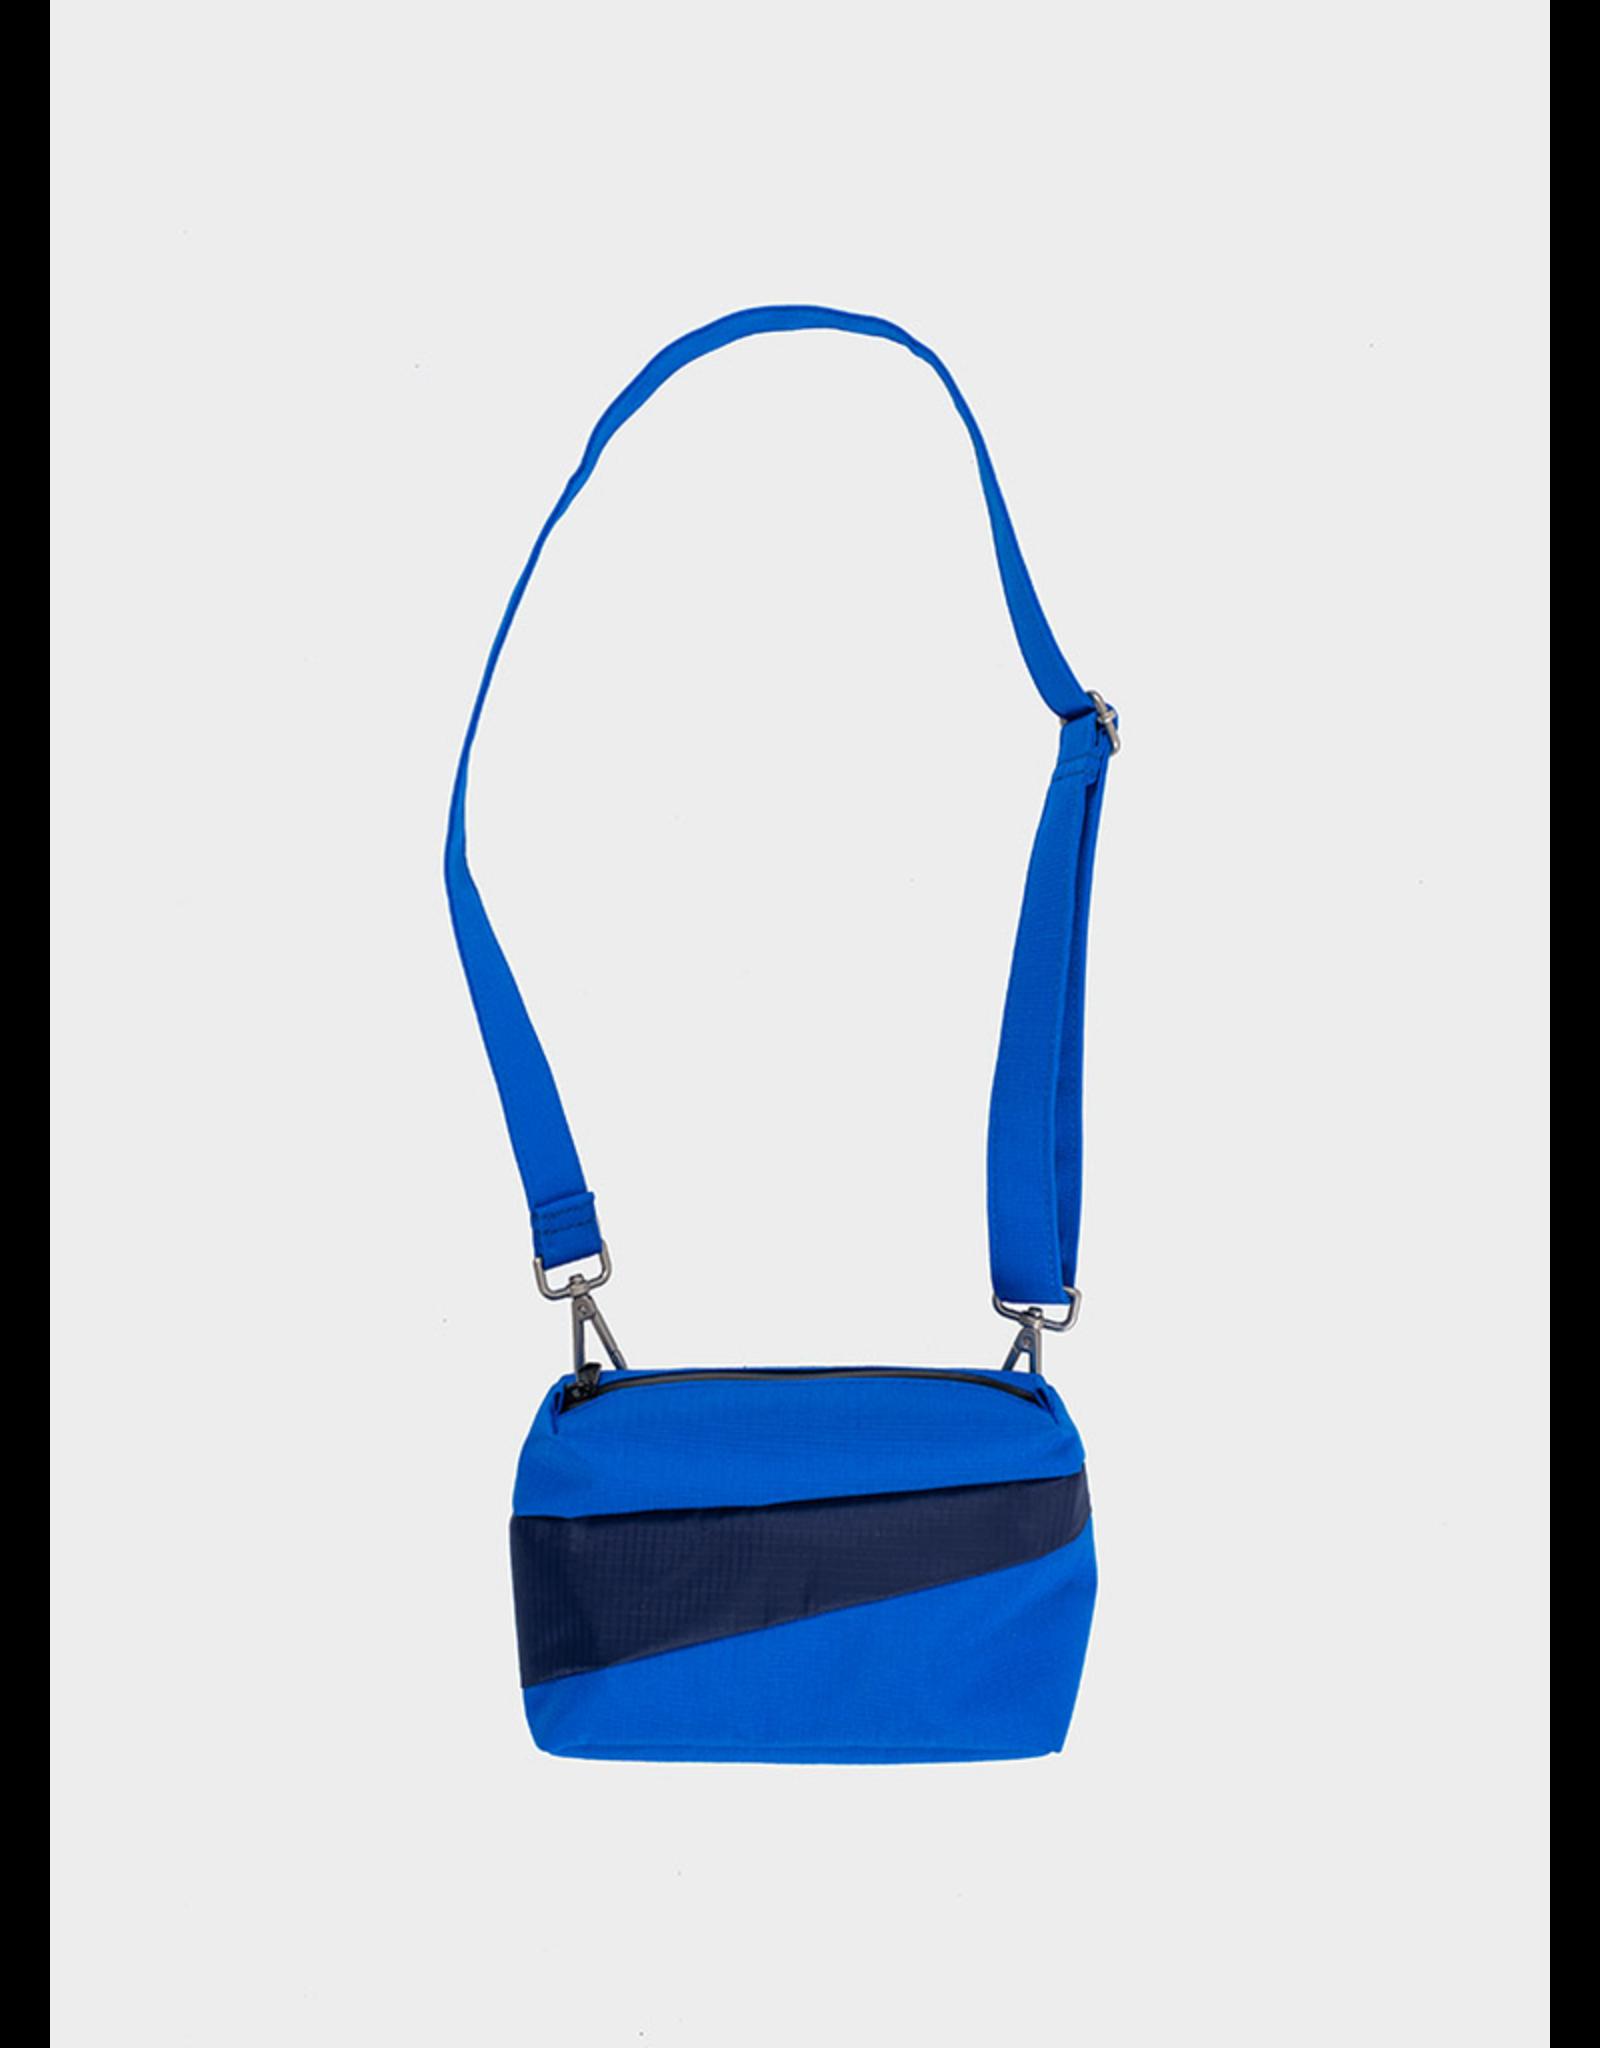 Susan Bijl Bum Bag S, Blue & Navy | 13 x 18,5 x 6,5